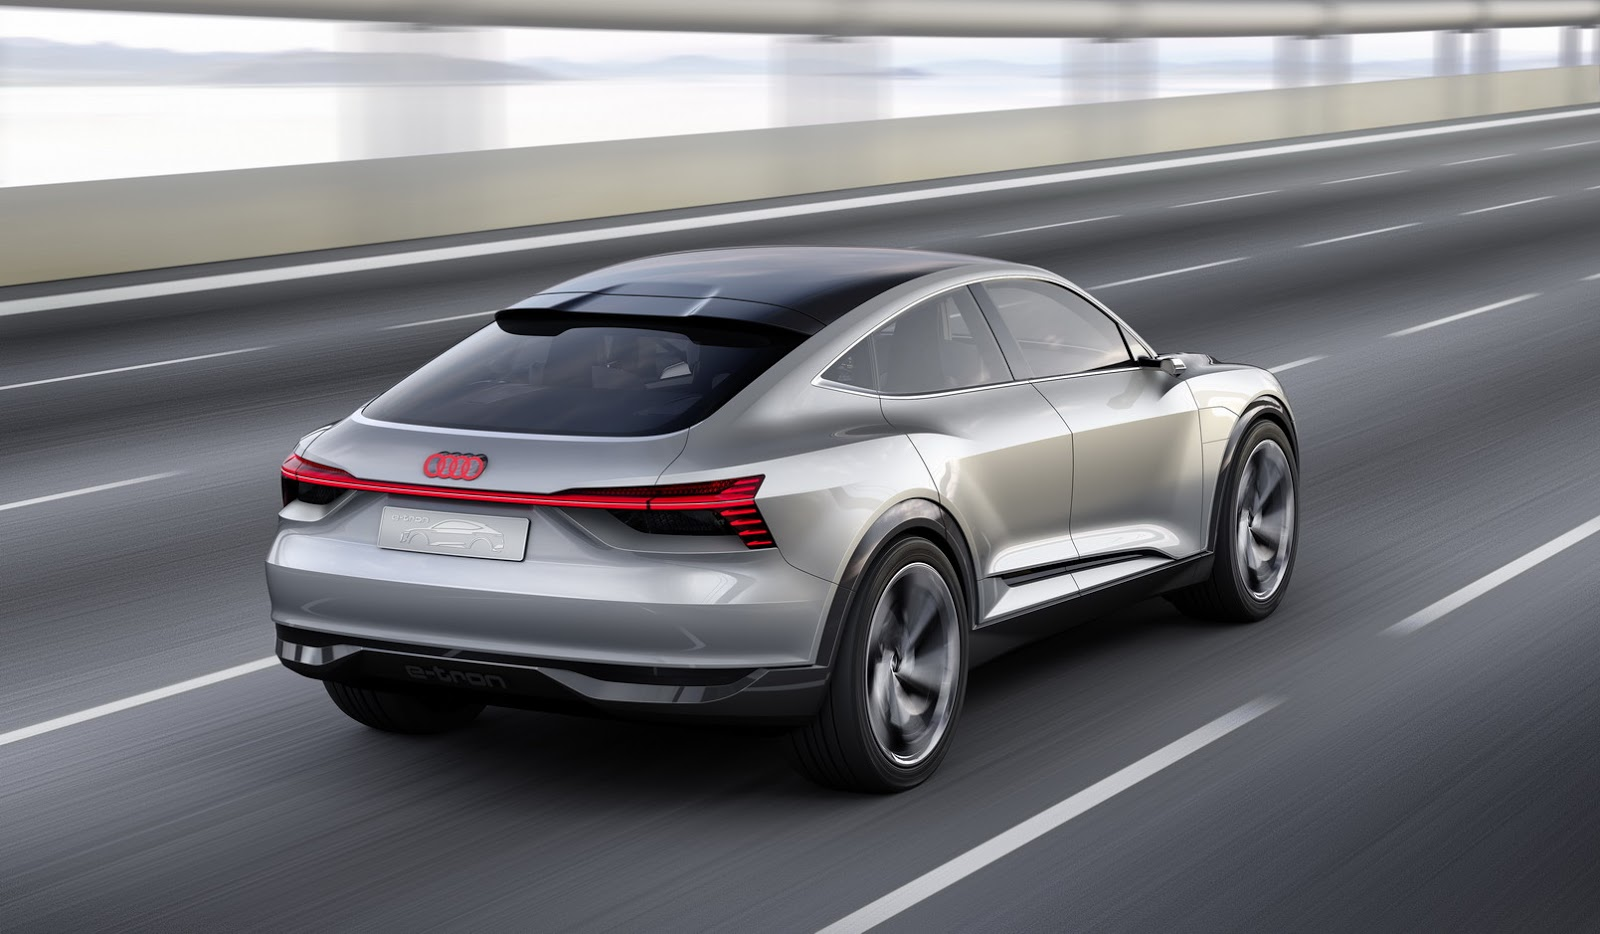 Ауди готовит конкурента бюджетному электромобилю Tesla Model 3